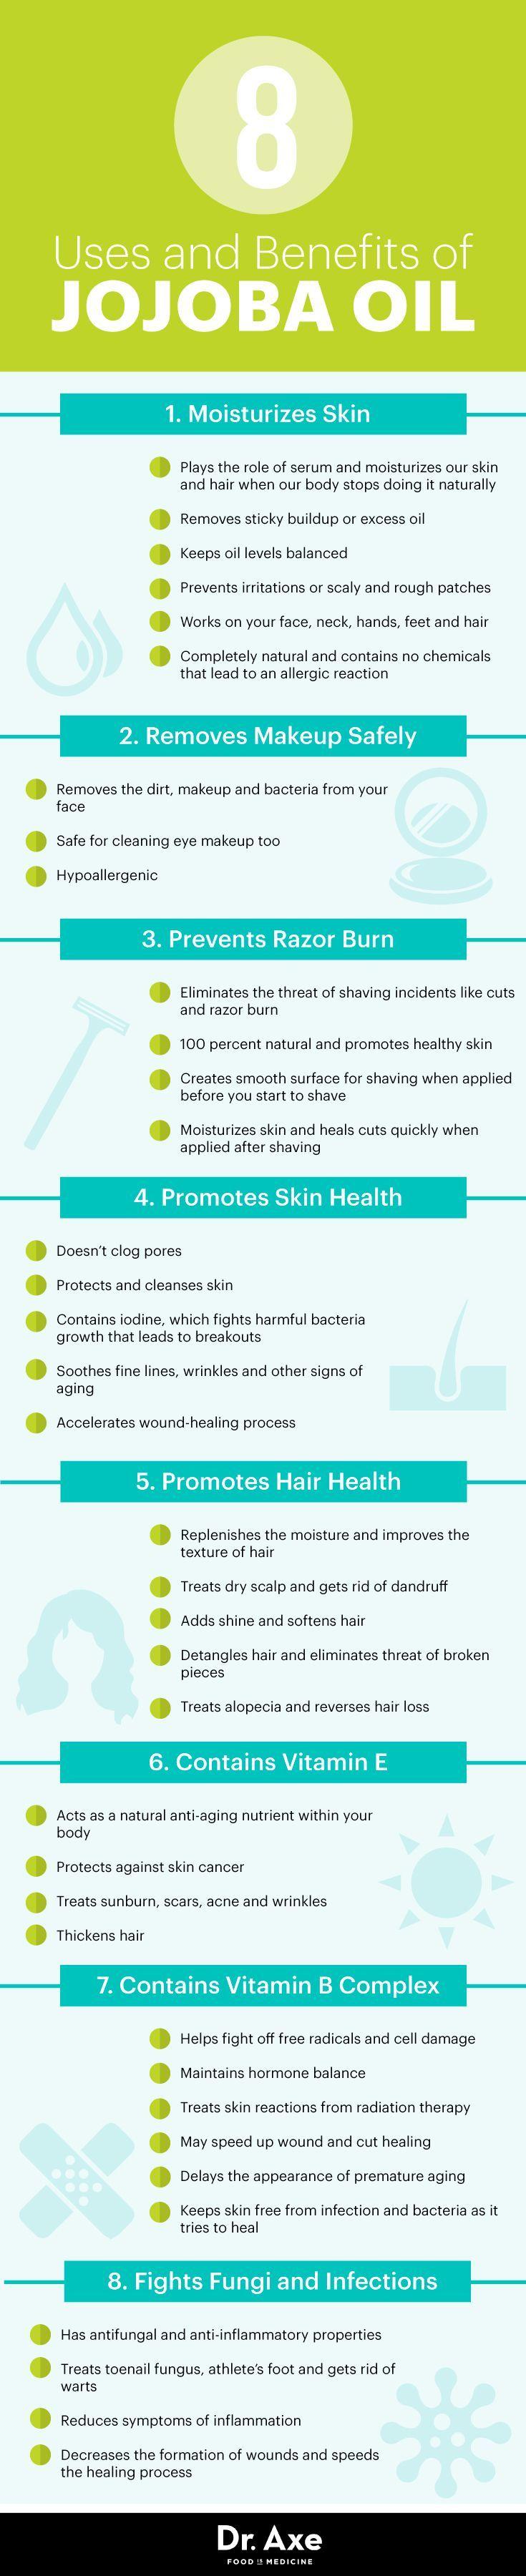 Jojoba oil infographic - Dr. axe http://www.draxe.com #health #holistic #natural